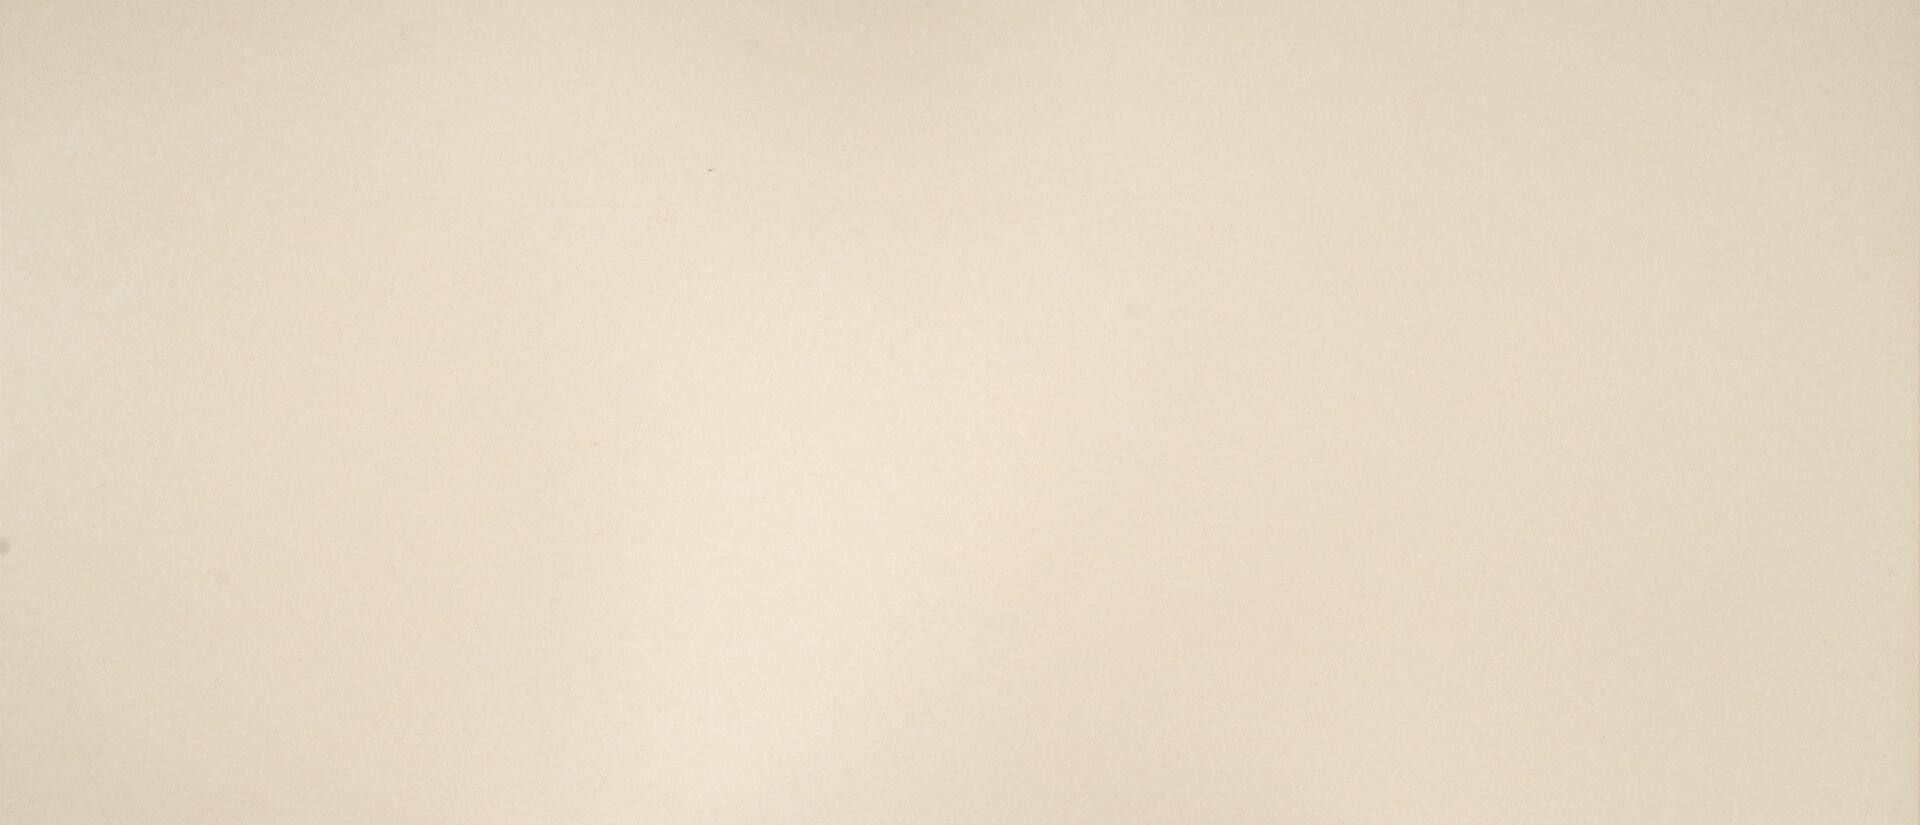 sahara beige